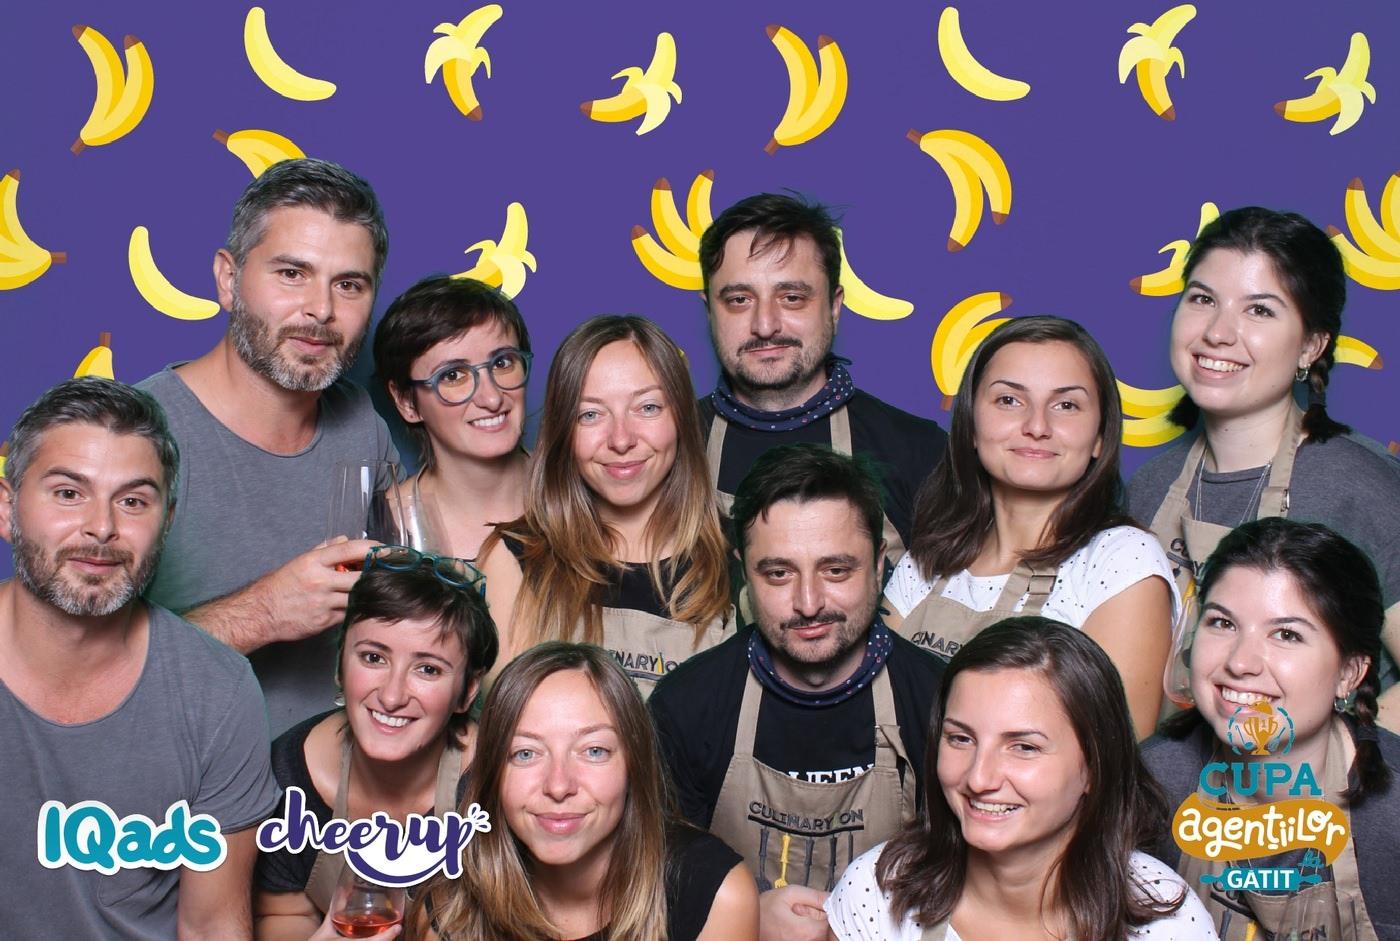 Cheerup-Photobooth-Clone-Fun